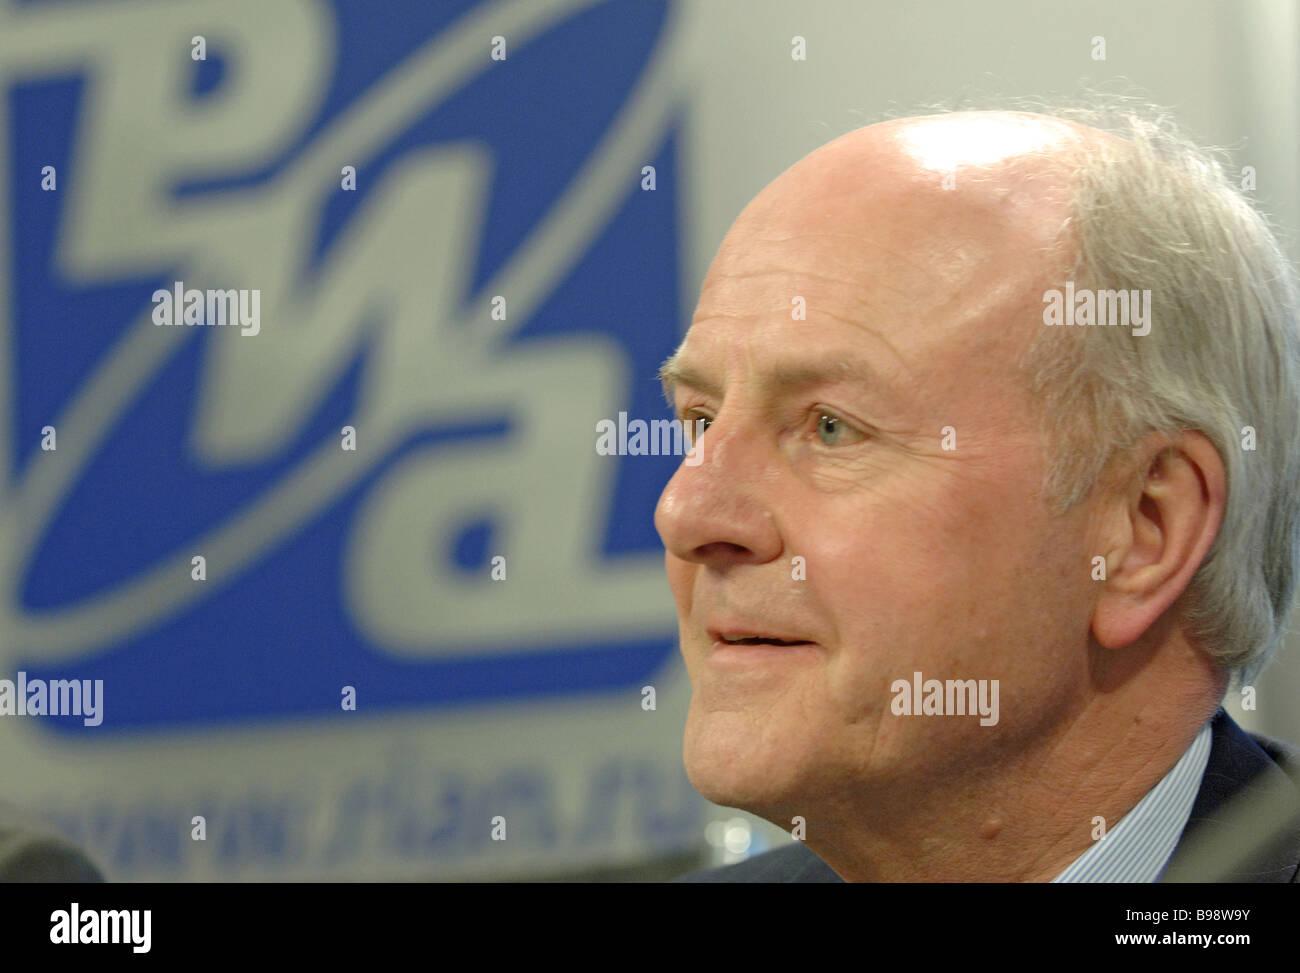 John Stuttard the Lord Mayor of London addressing a RIA Novosti news conference - Stock Image